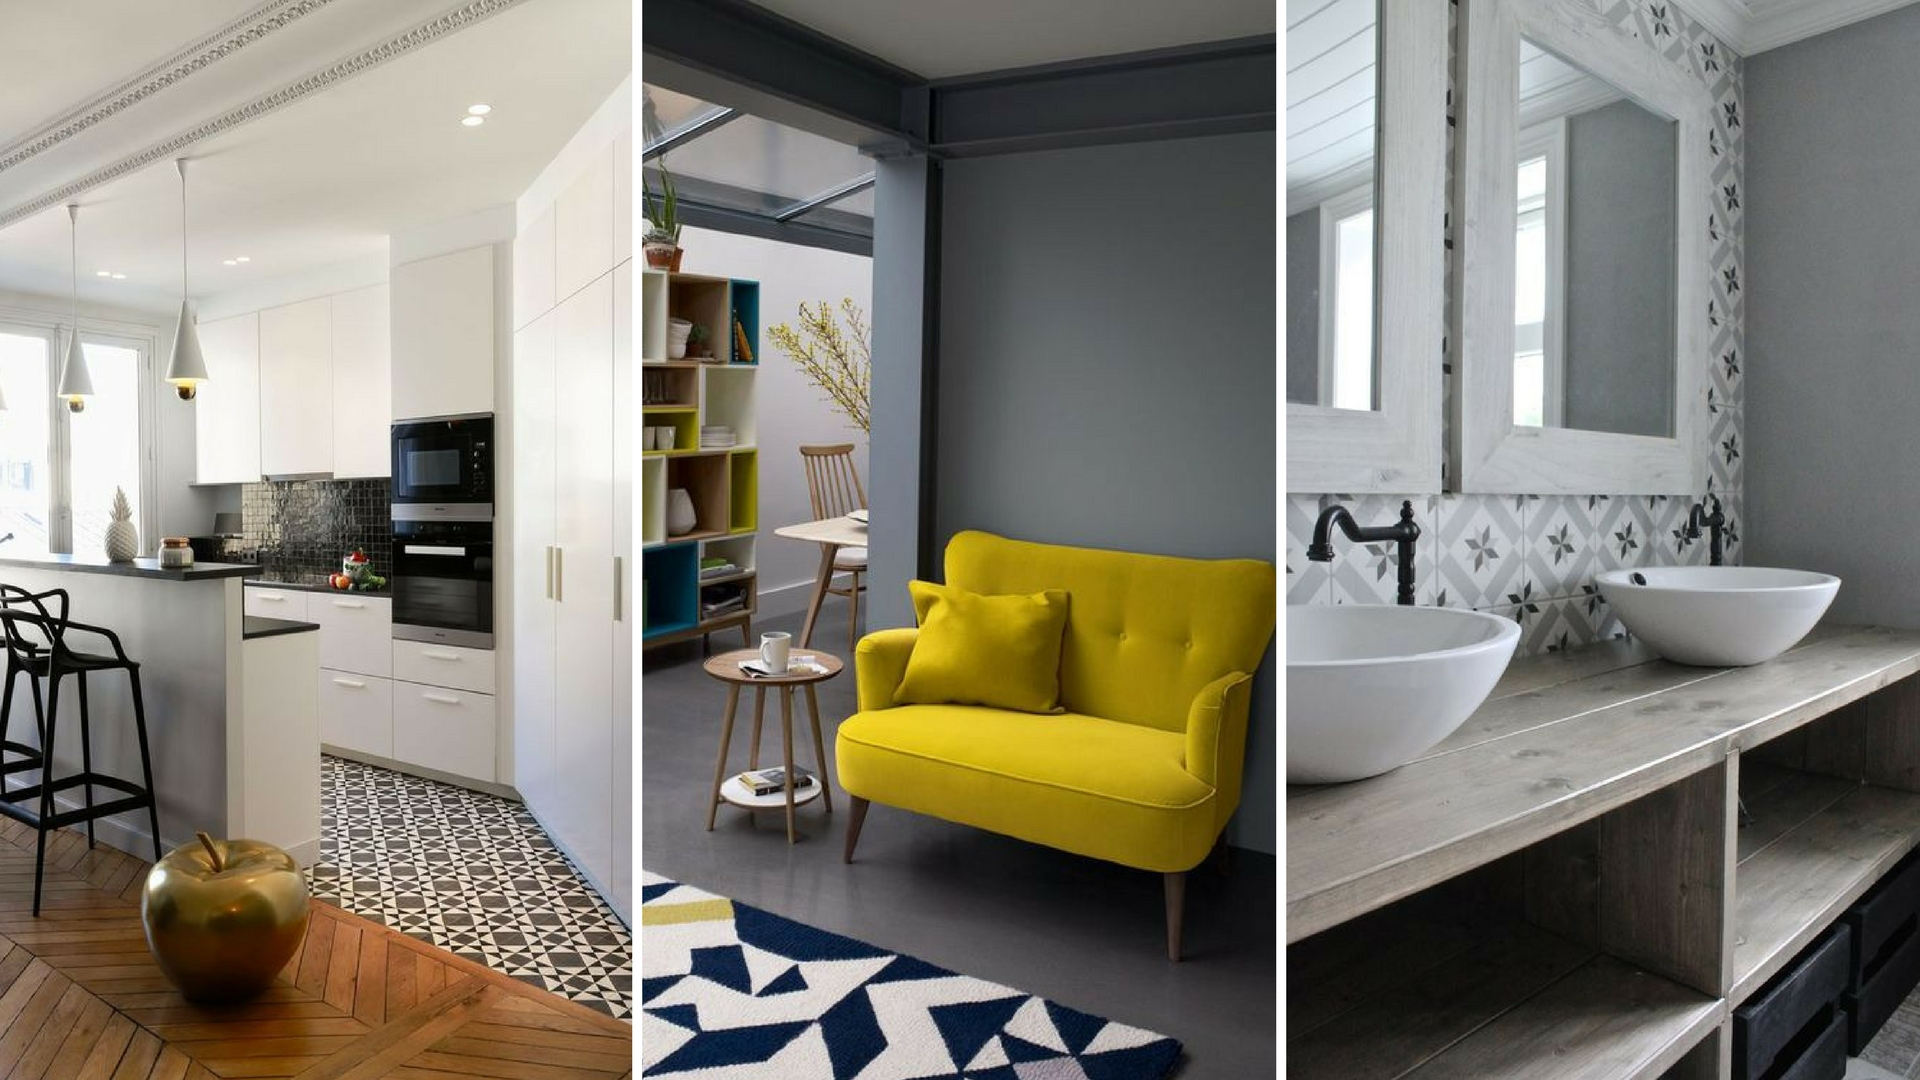 id e ambiance graphique par katell guivarch ossi design. Black Bedroom Furniture Sets. Home Design Ideas